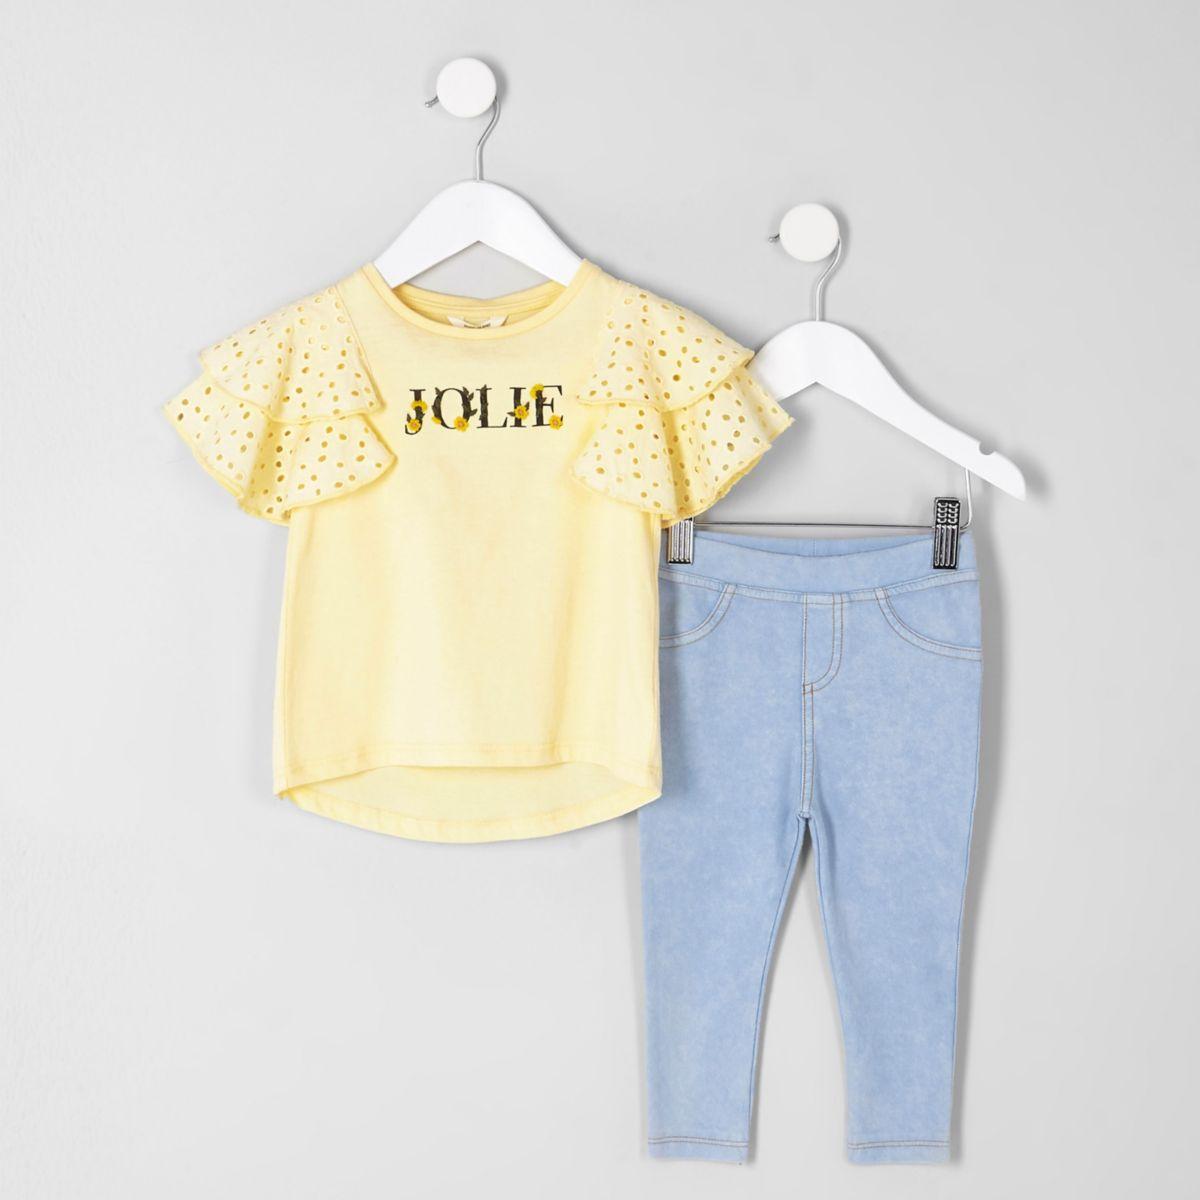 Mini Girls Yellow Frill Sleeve T-shirt Outfit - Baby Girls Outfits - Mini Girls - Girls